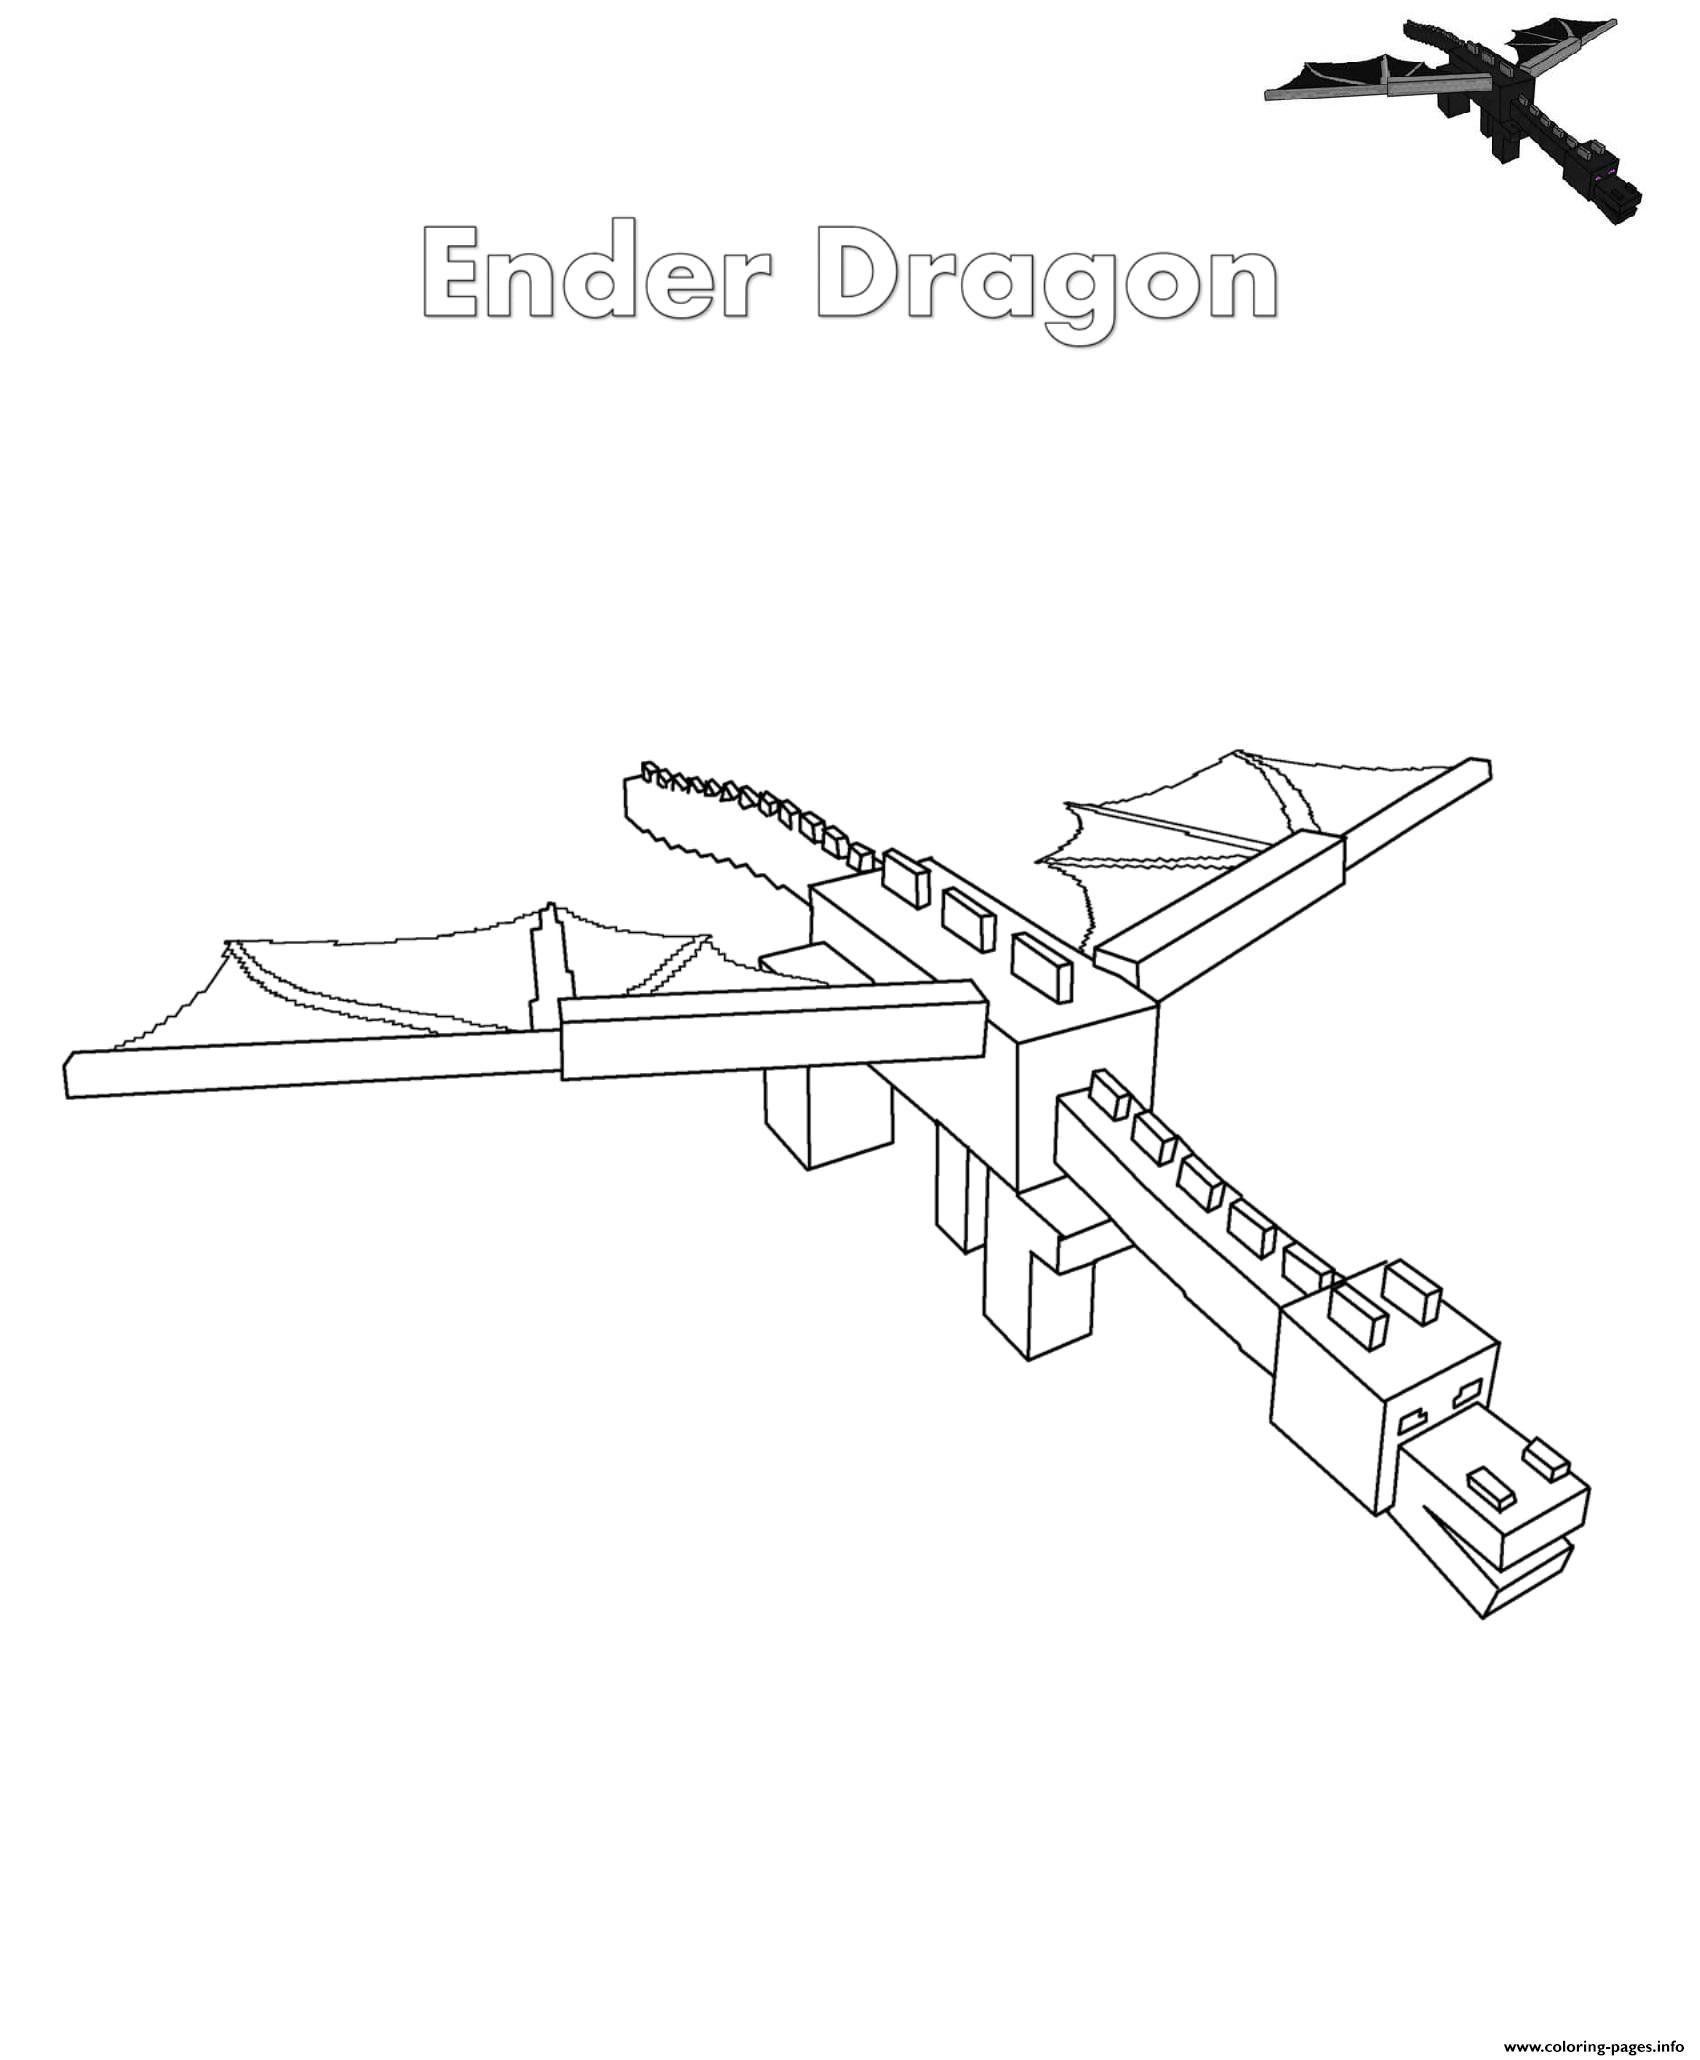 Pin On Antonietta Monahan Dragon Coloring Pages Minecraft Ender Dragon Dragon Coloring Page